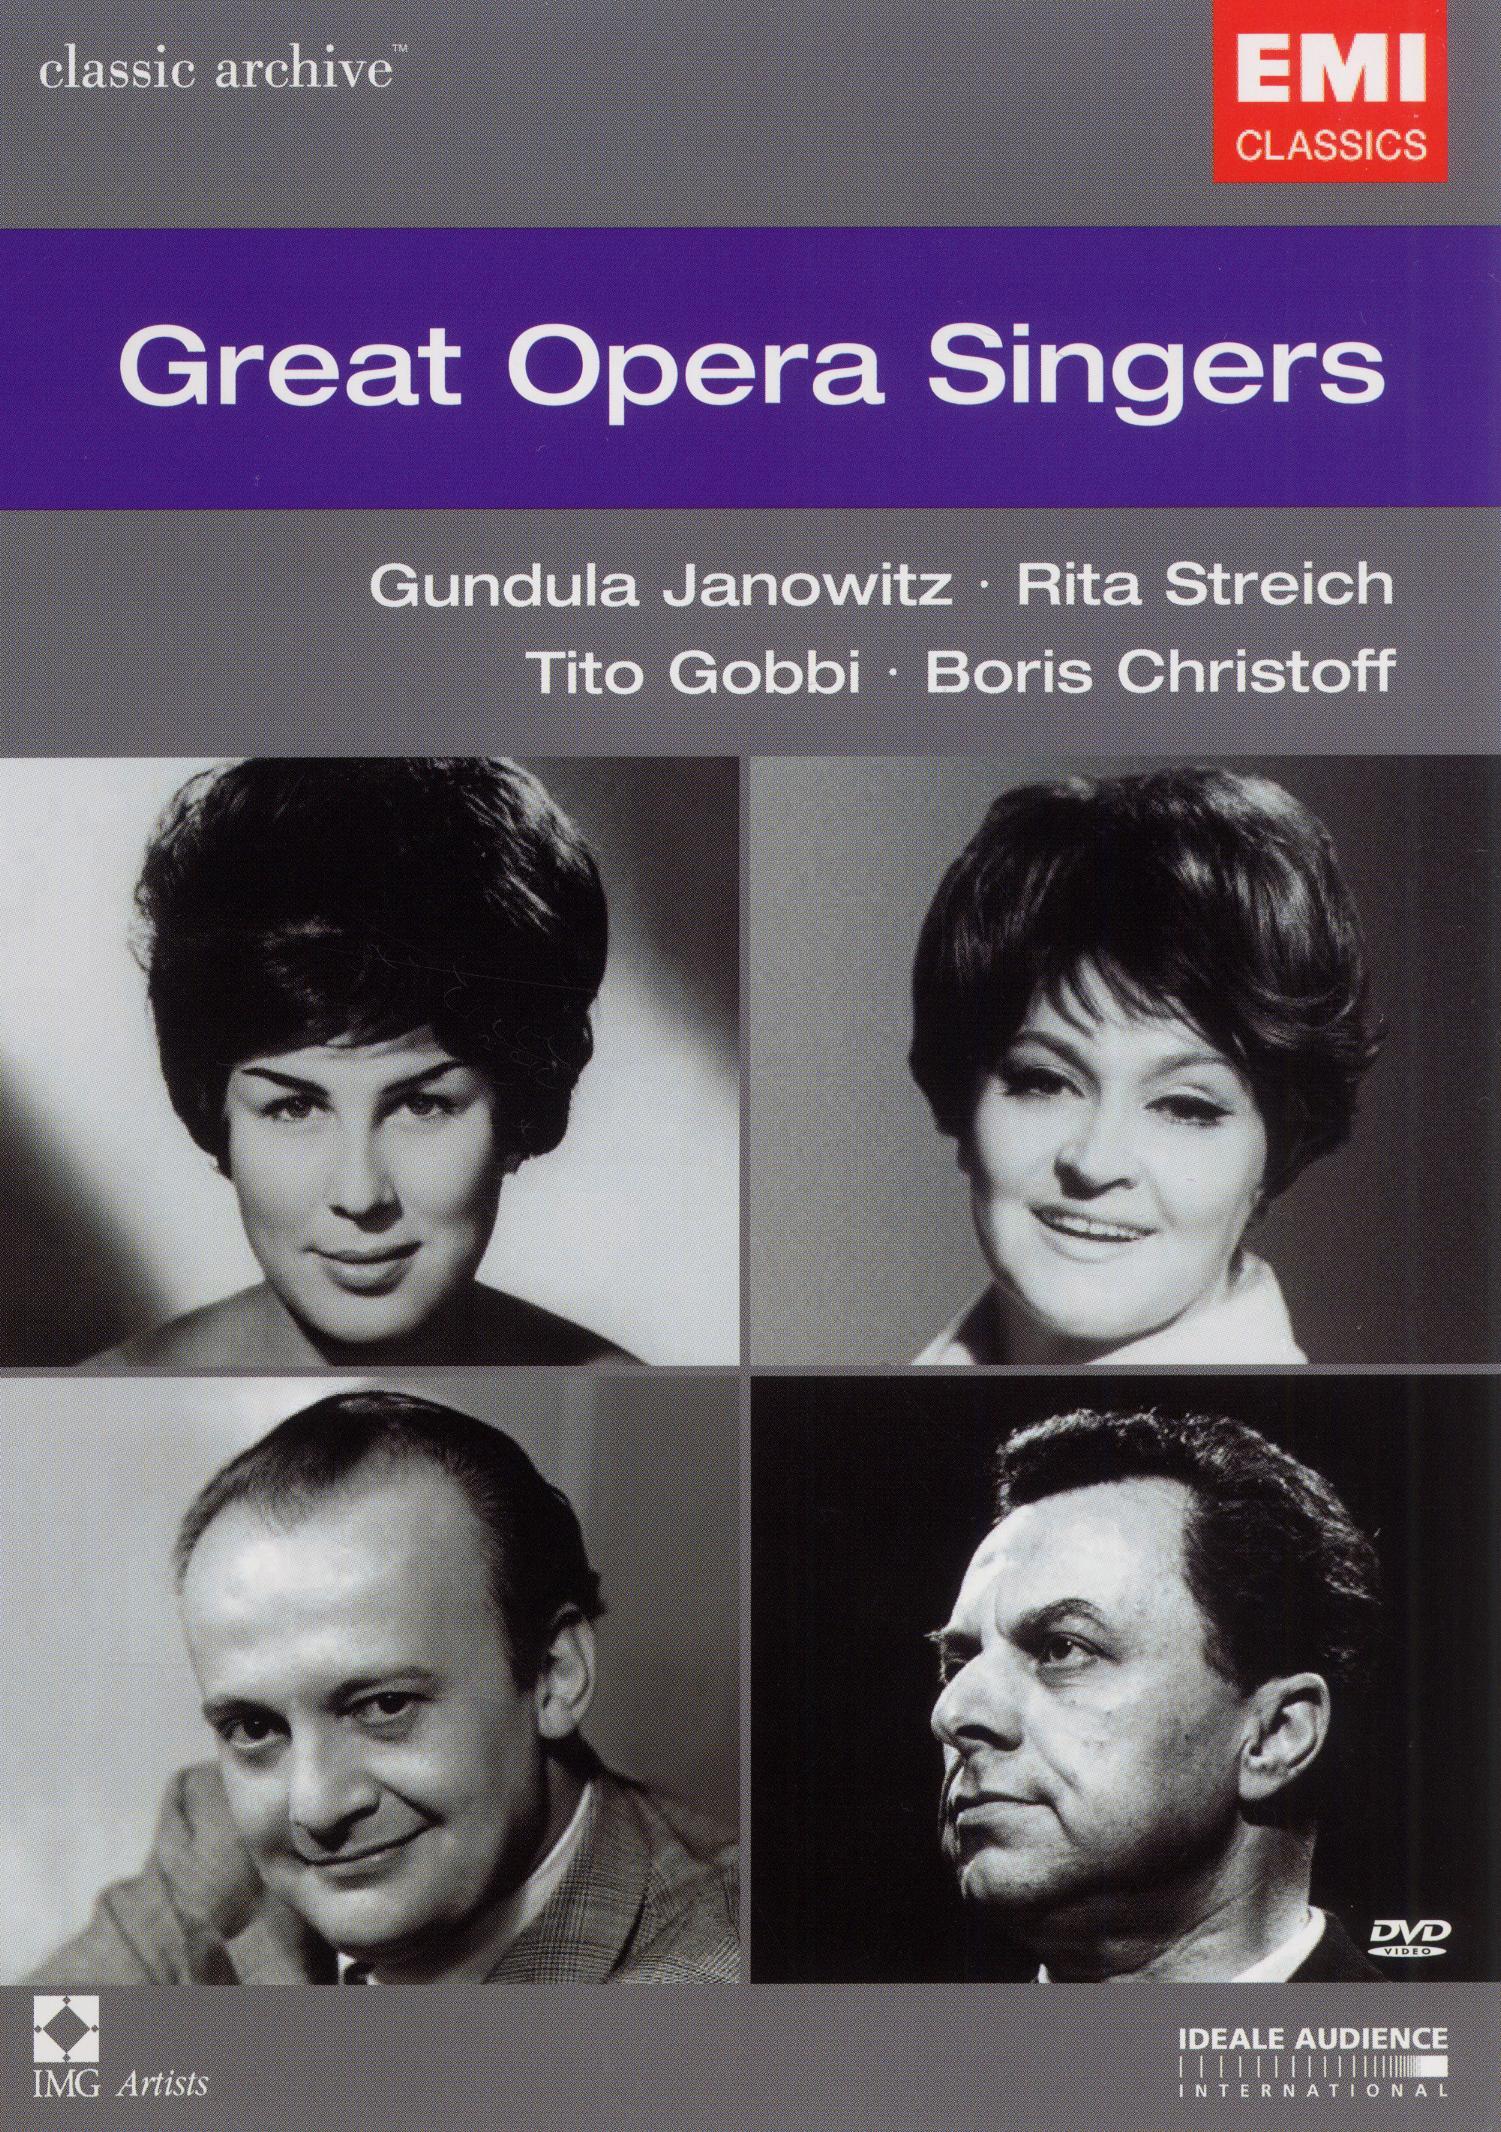 Great Opera Singers